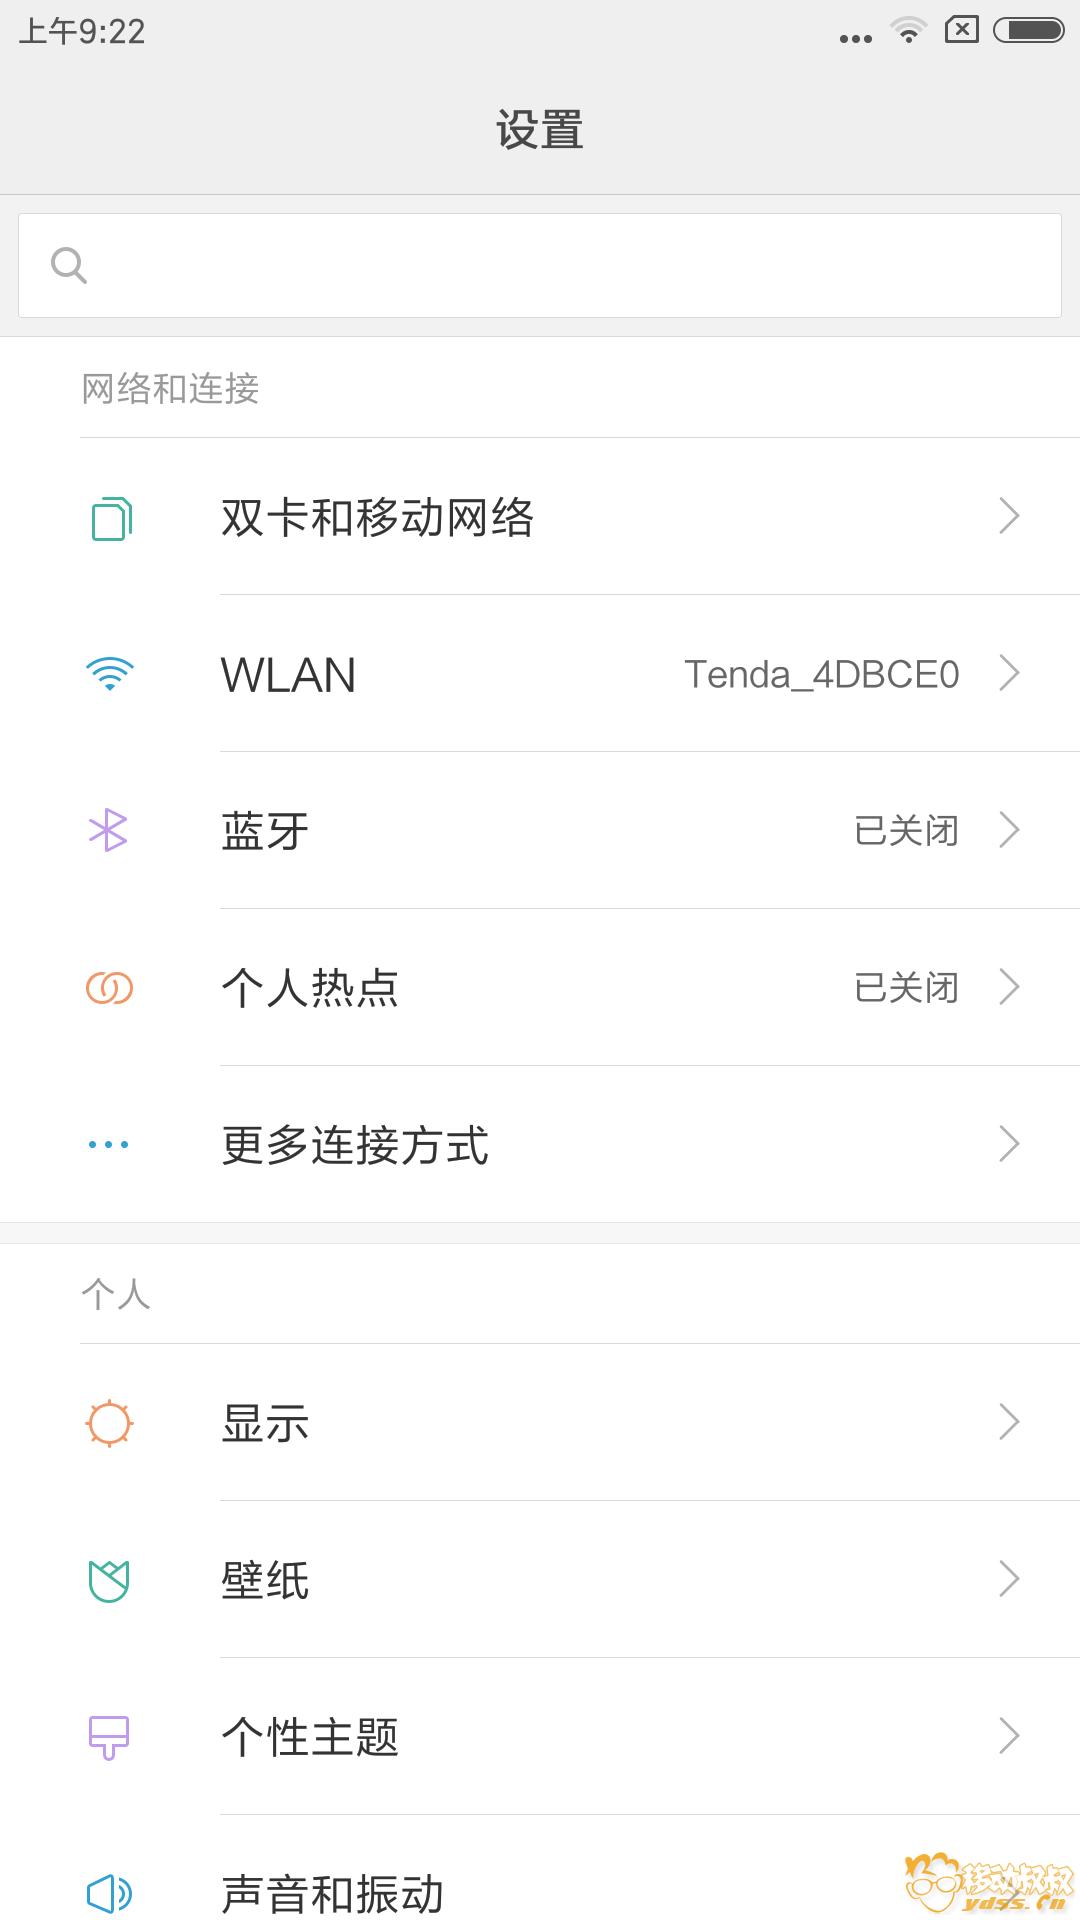 Screenshot_2017-07-15-09-22-06-217_com.android.settings.png